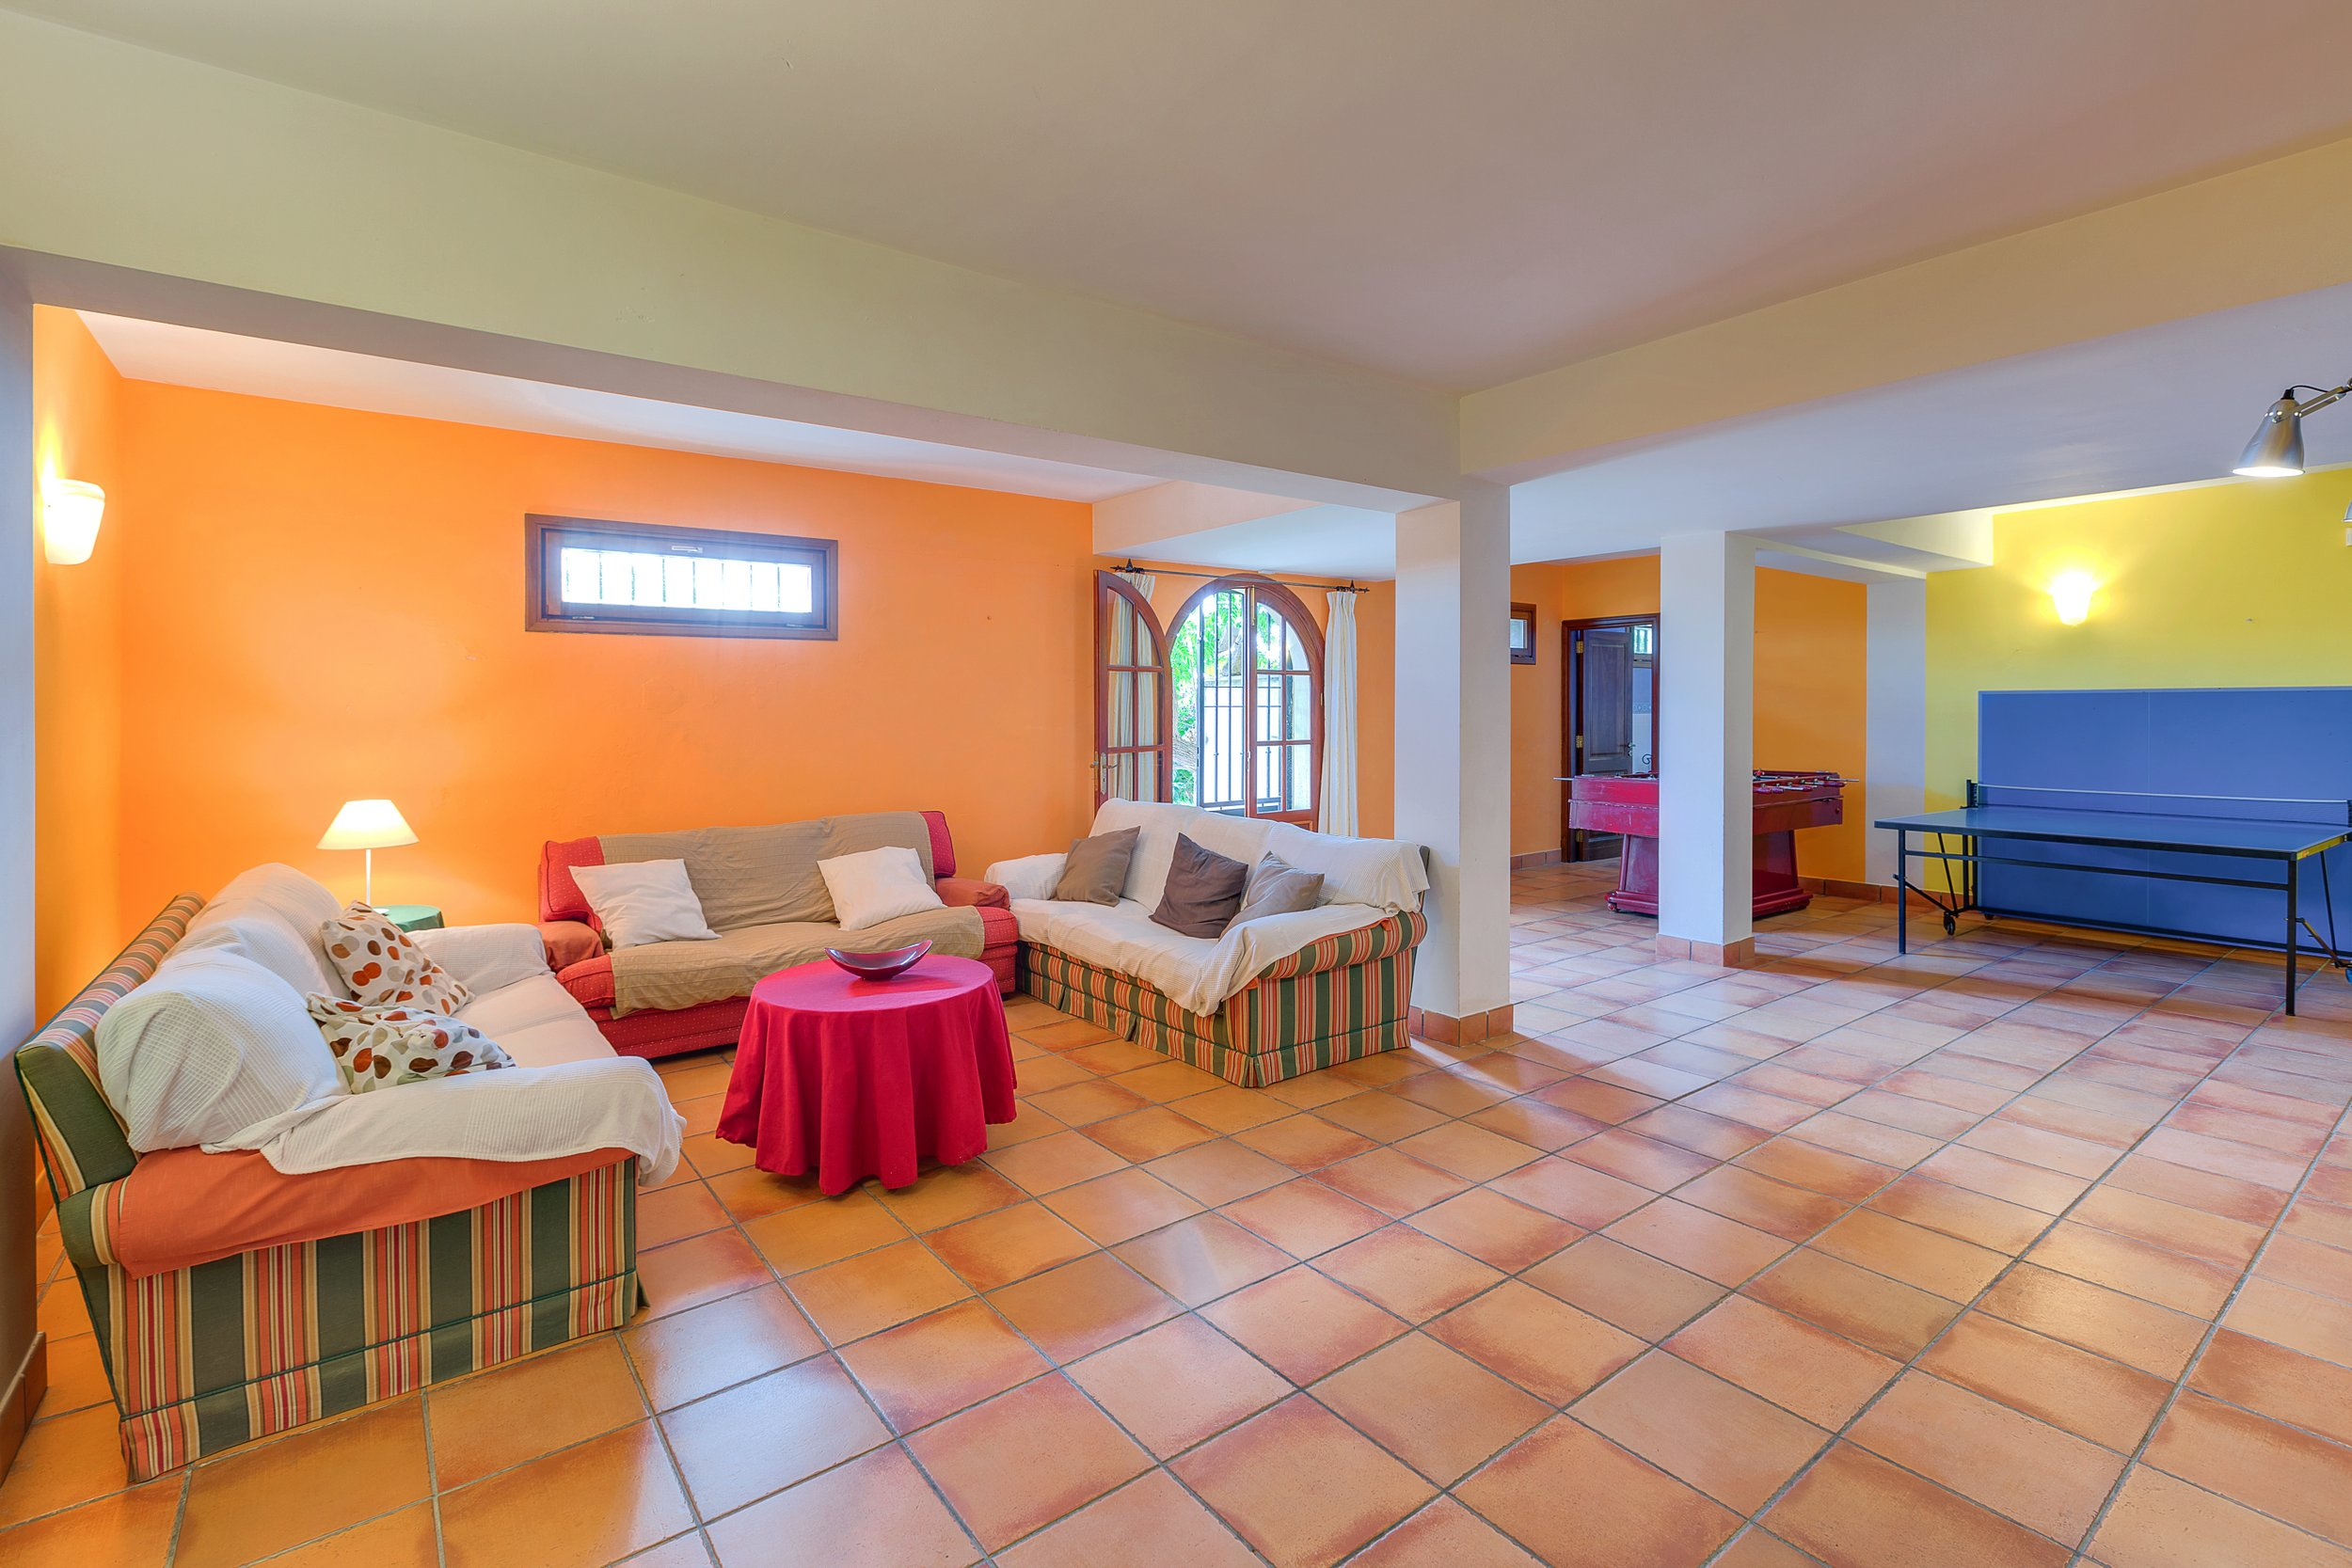 Maison de vacances Villa Cirera in Alaro (2611793), Alaro, Majorque, Iles Baléares, Espagne, image 18